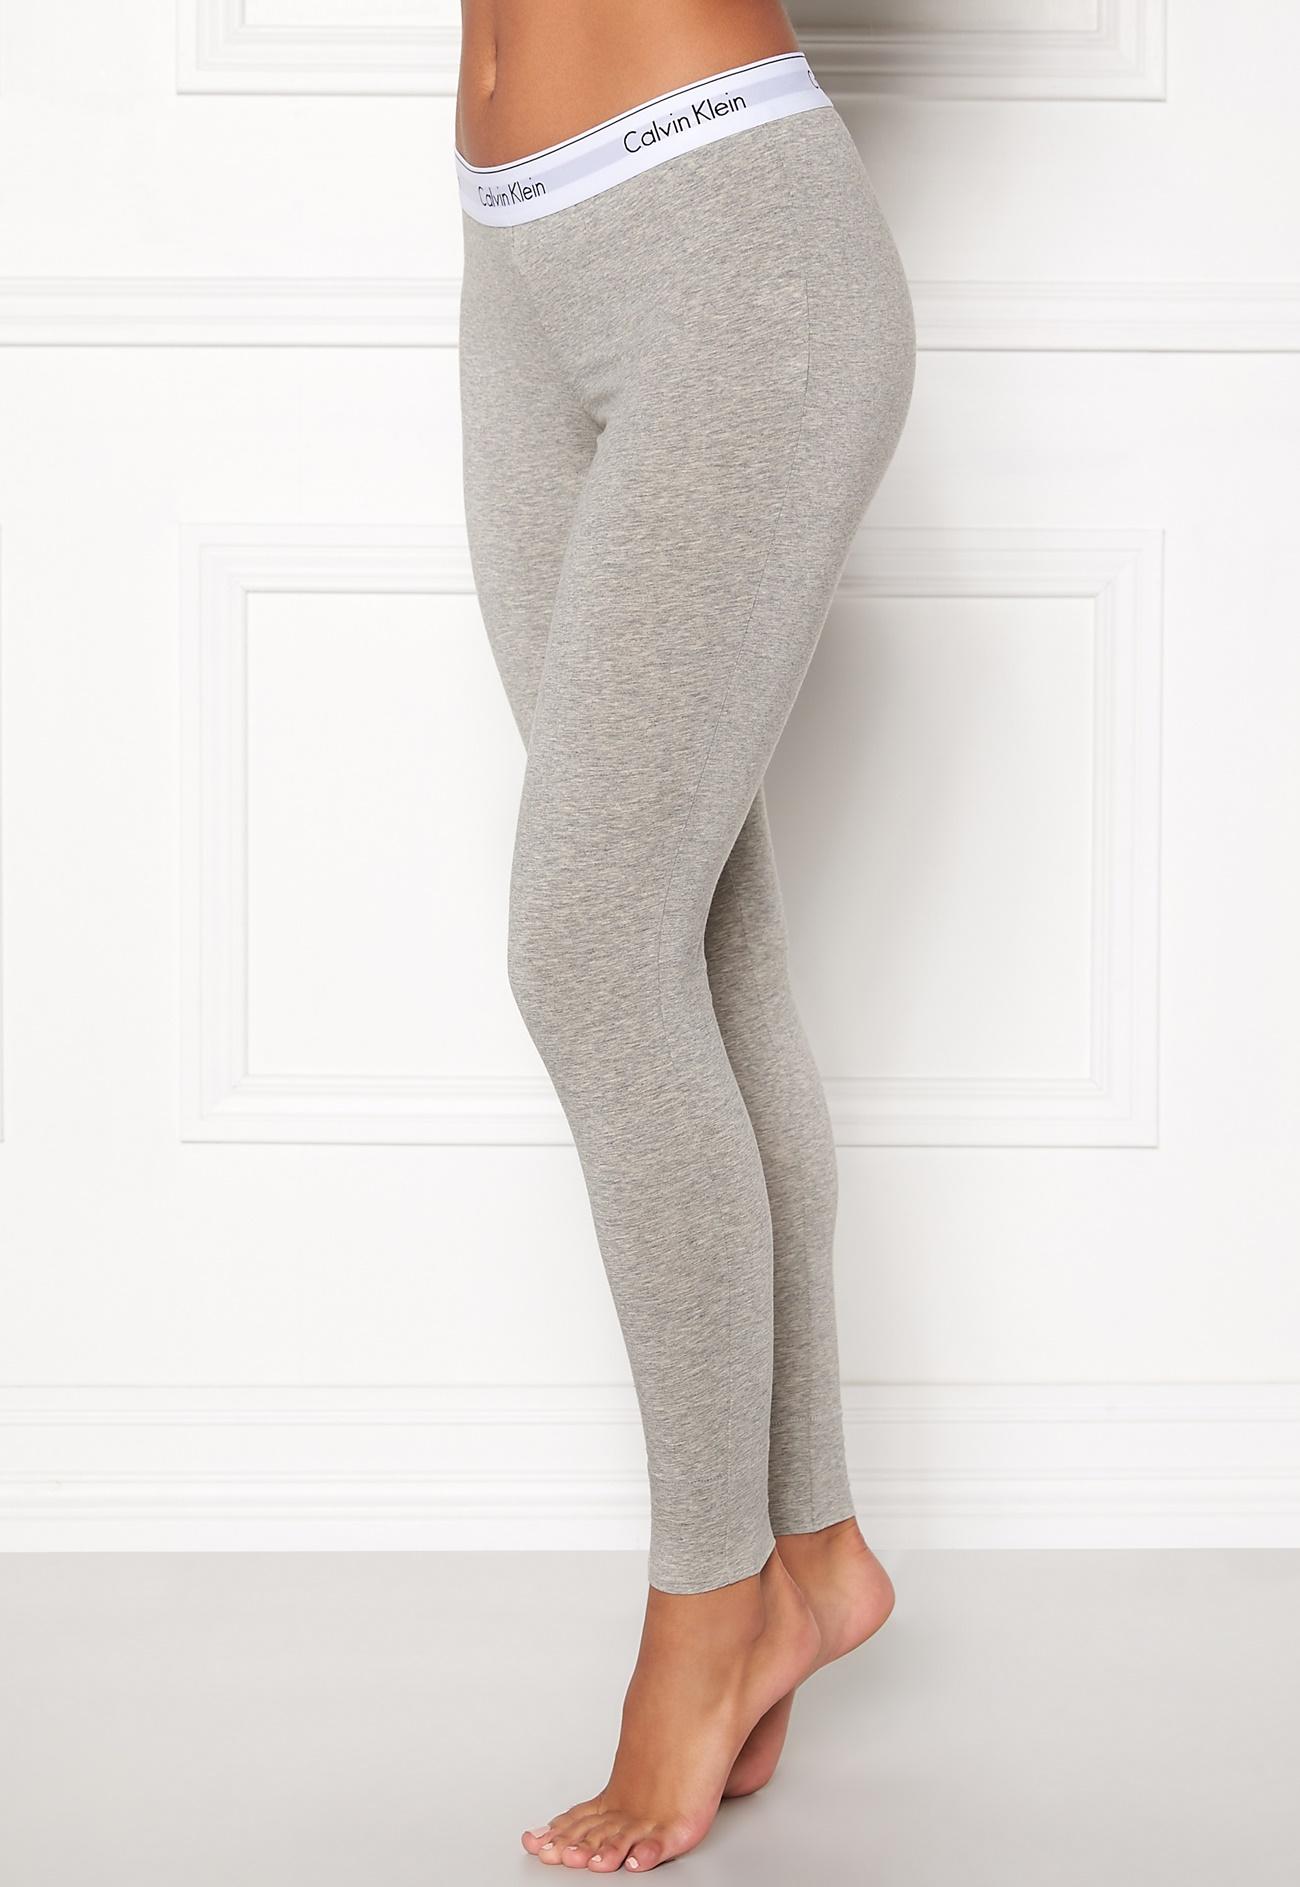 Calvin Klein Legging Pant 0020 Grey - Bubbleroom